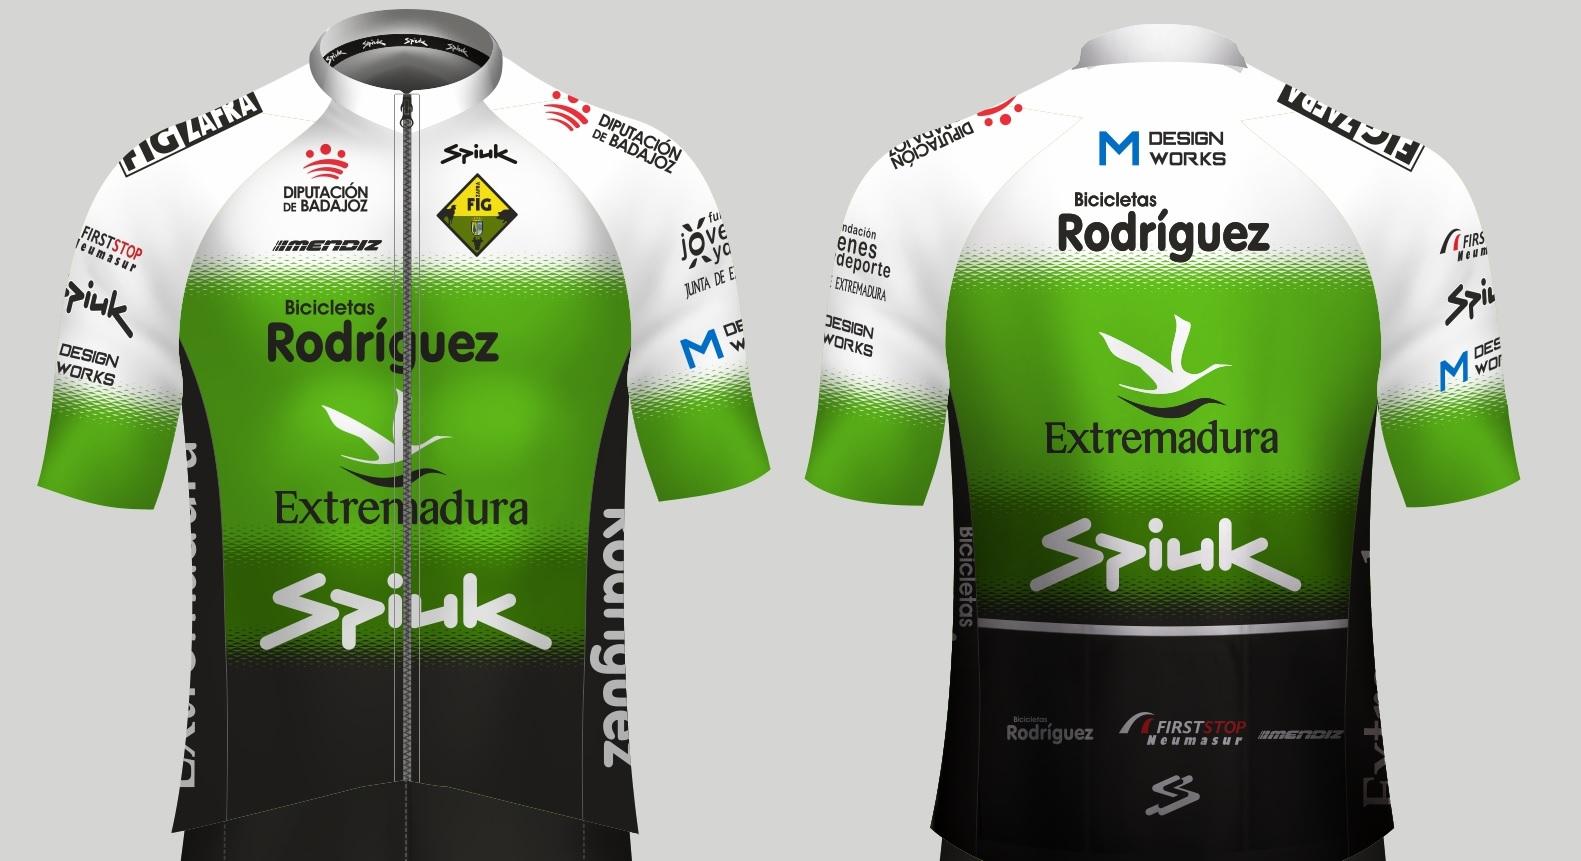 Maillot Bicicletas Rodriguez Extremadura 2021 Spiuk